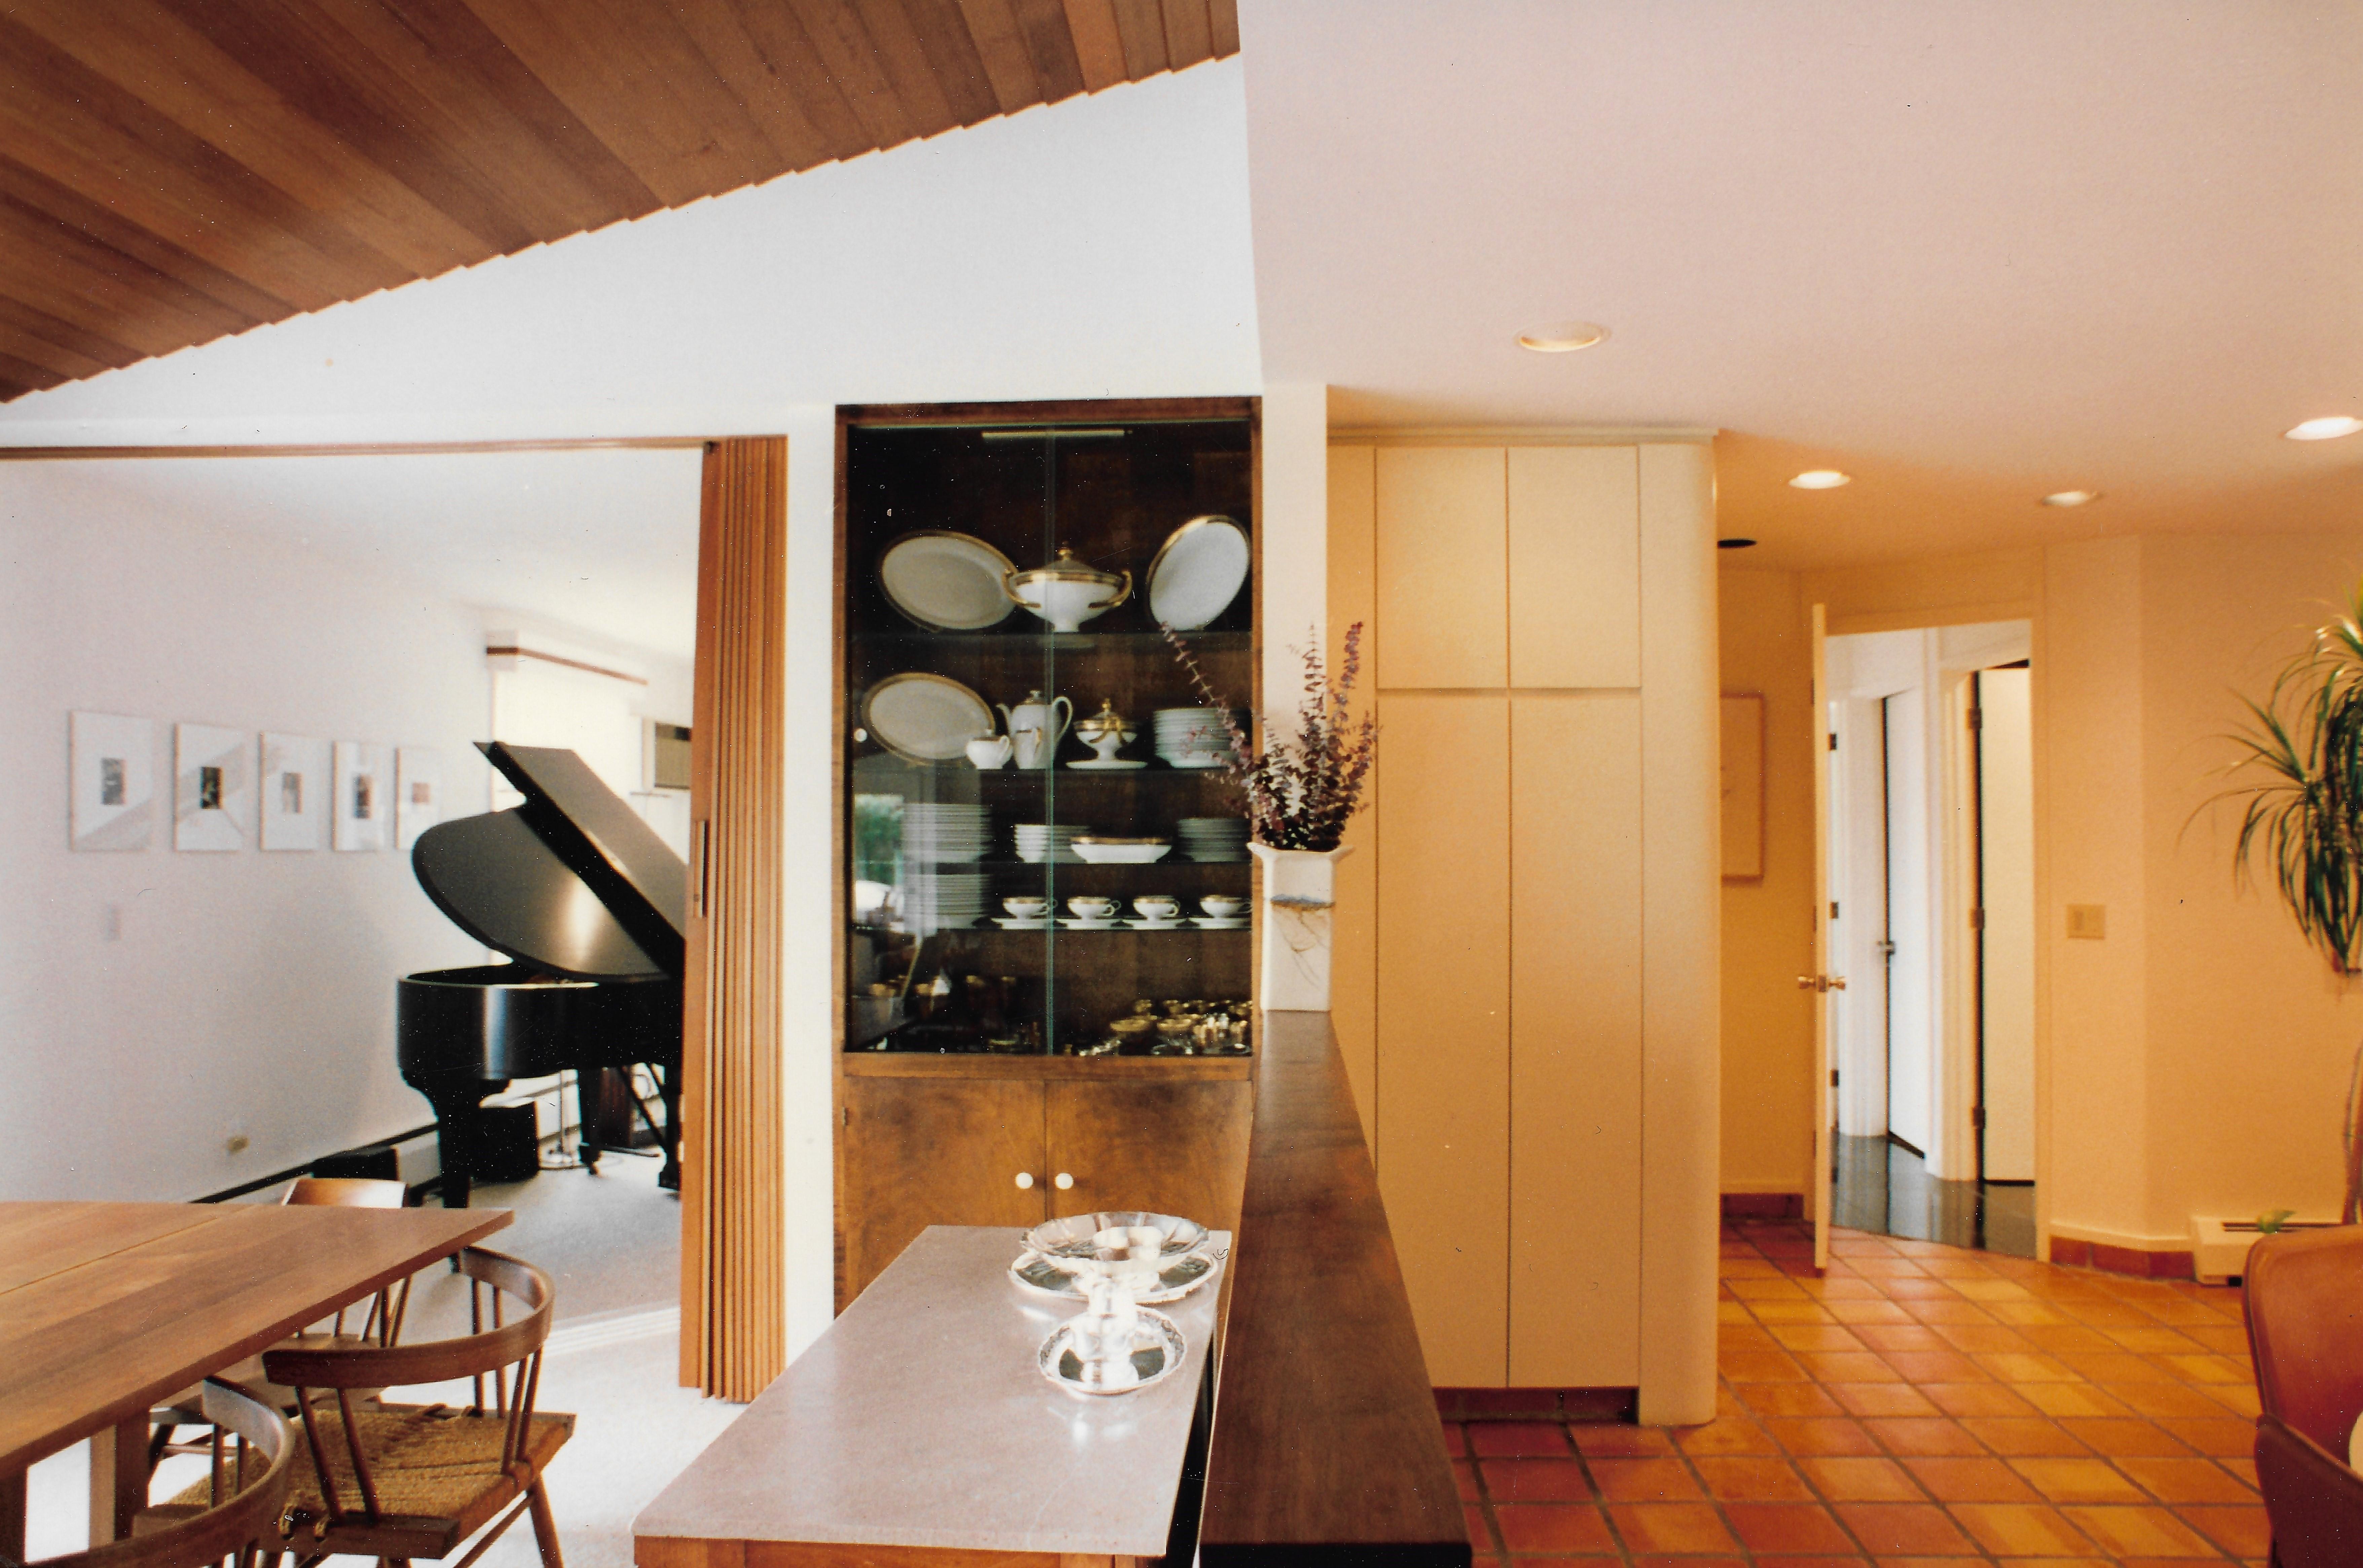 russ deveau design provincetown fort lauderedal new york russell deveau design